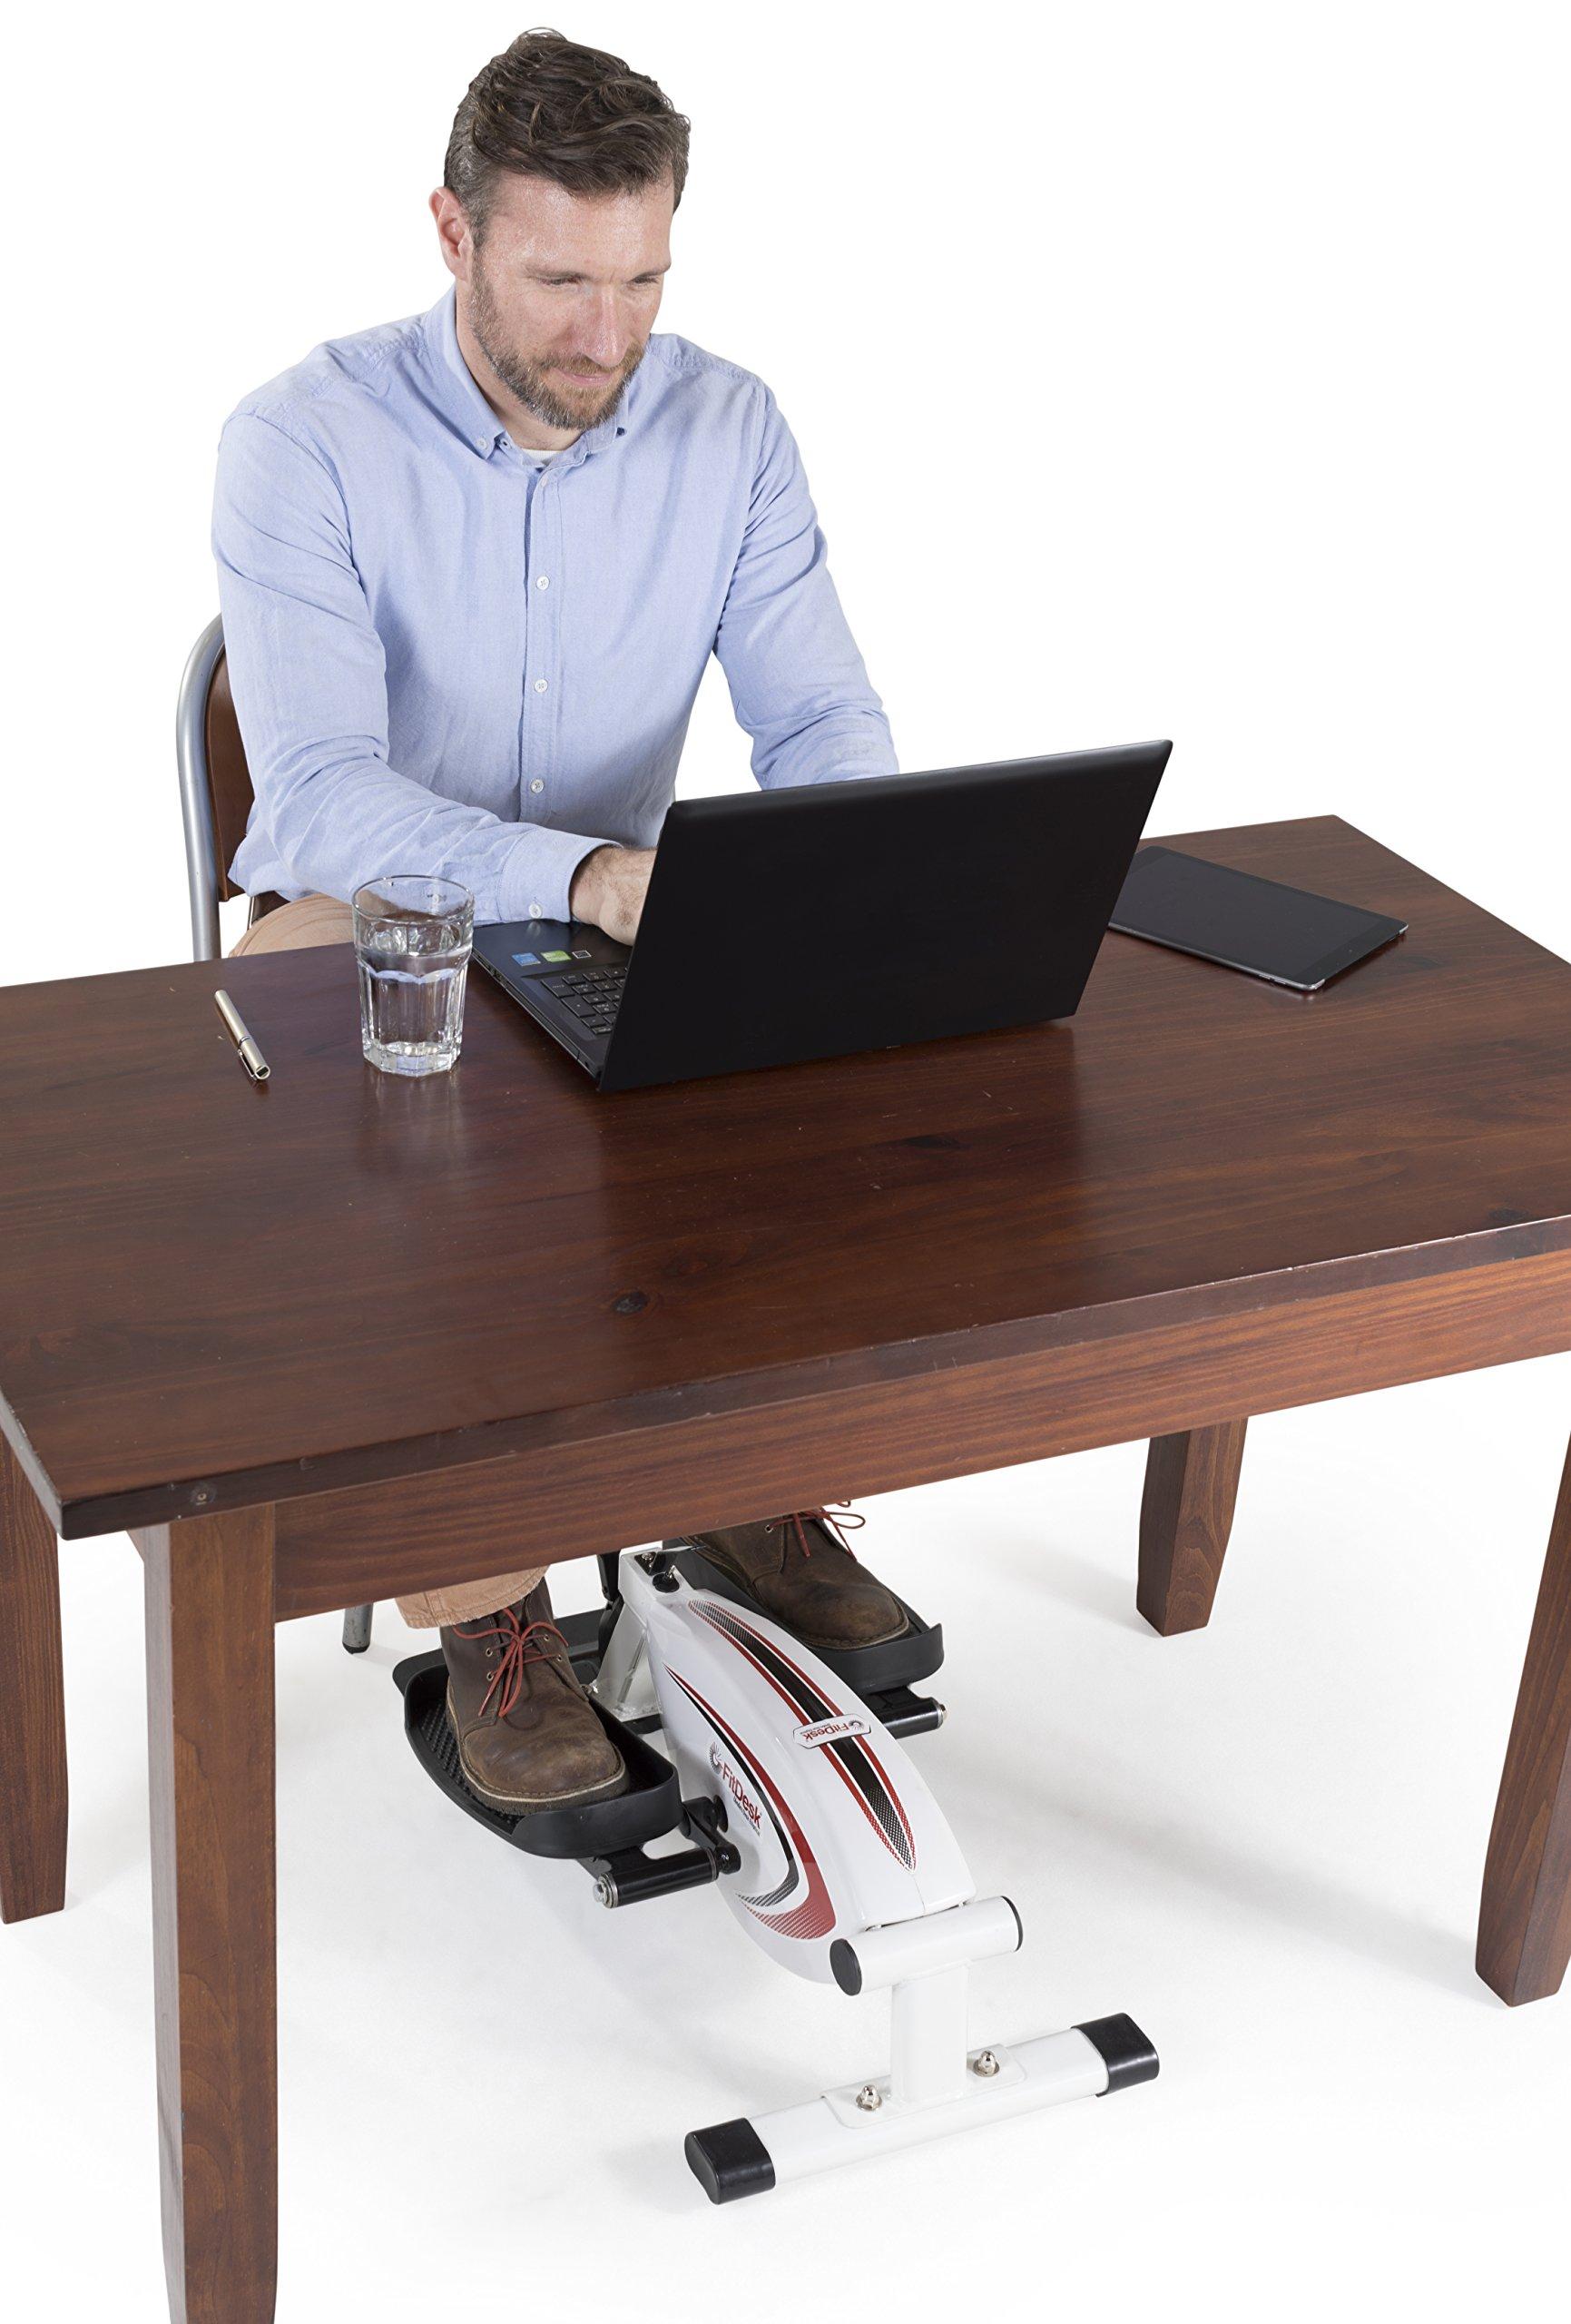 FitDesk Under Desk Elliptical Trainer by FitDesk (Image #6)